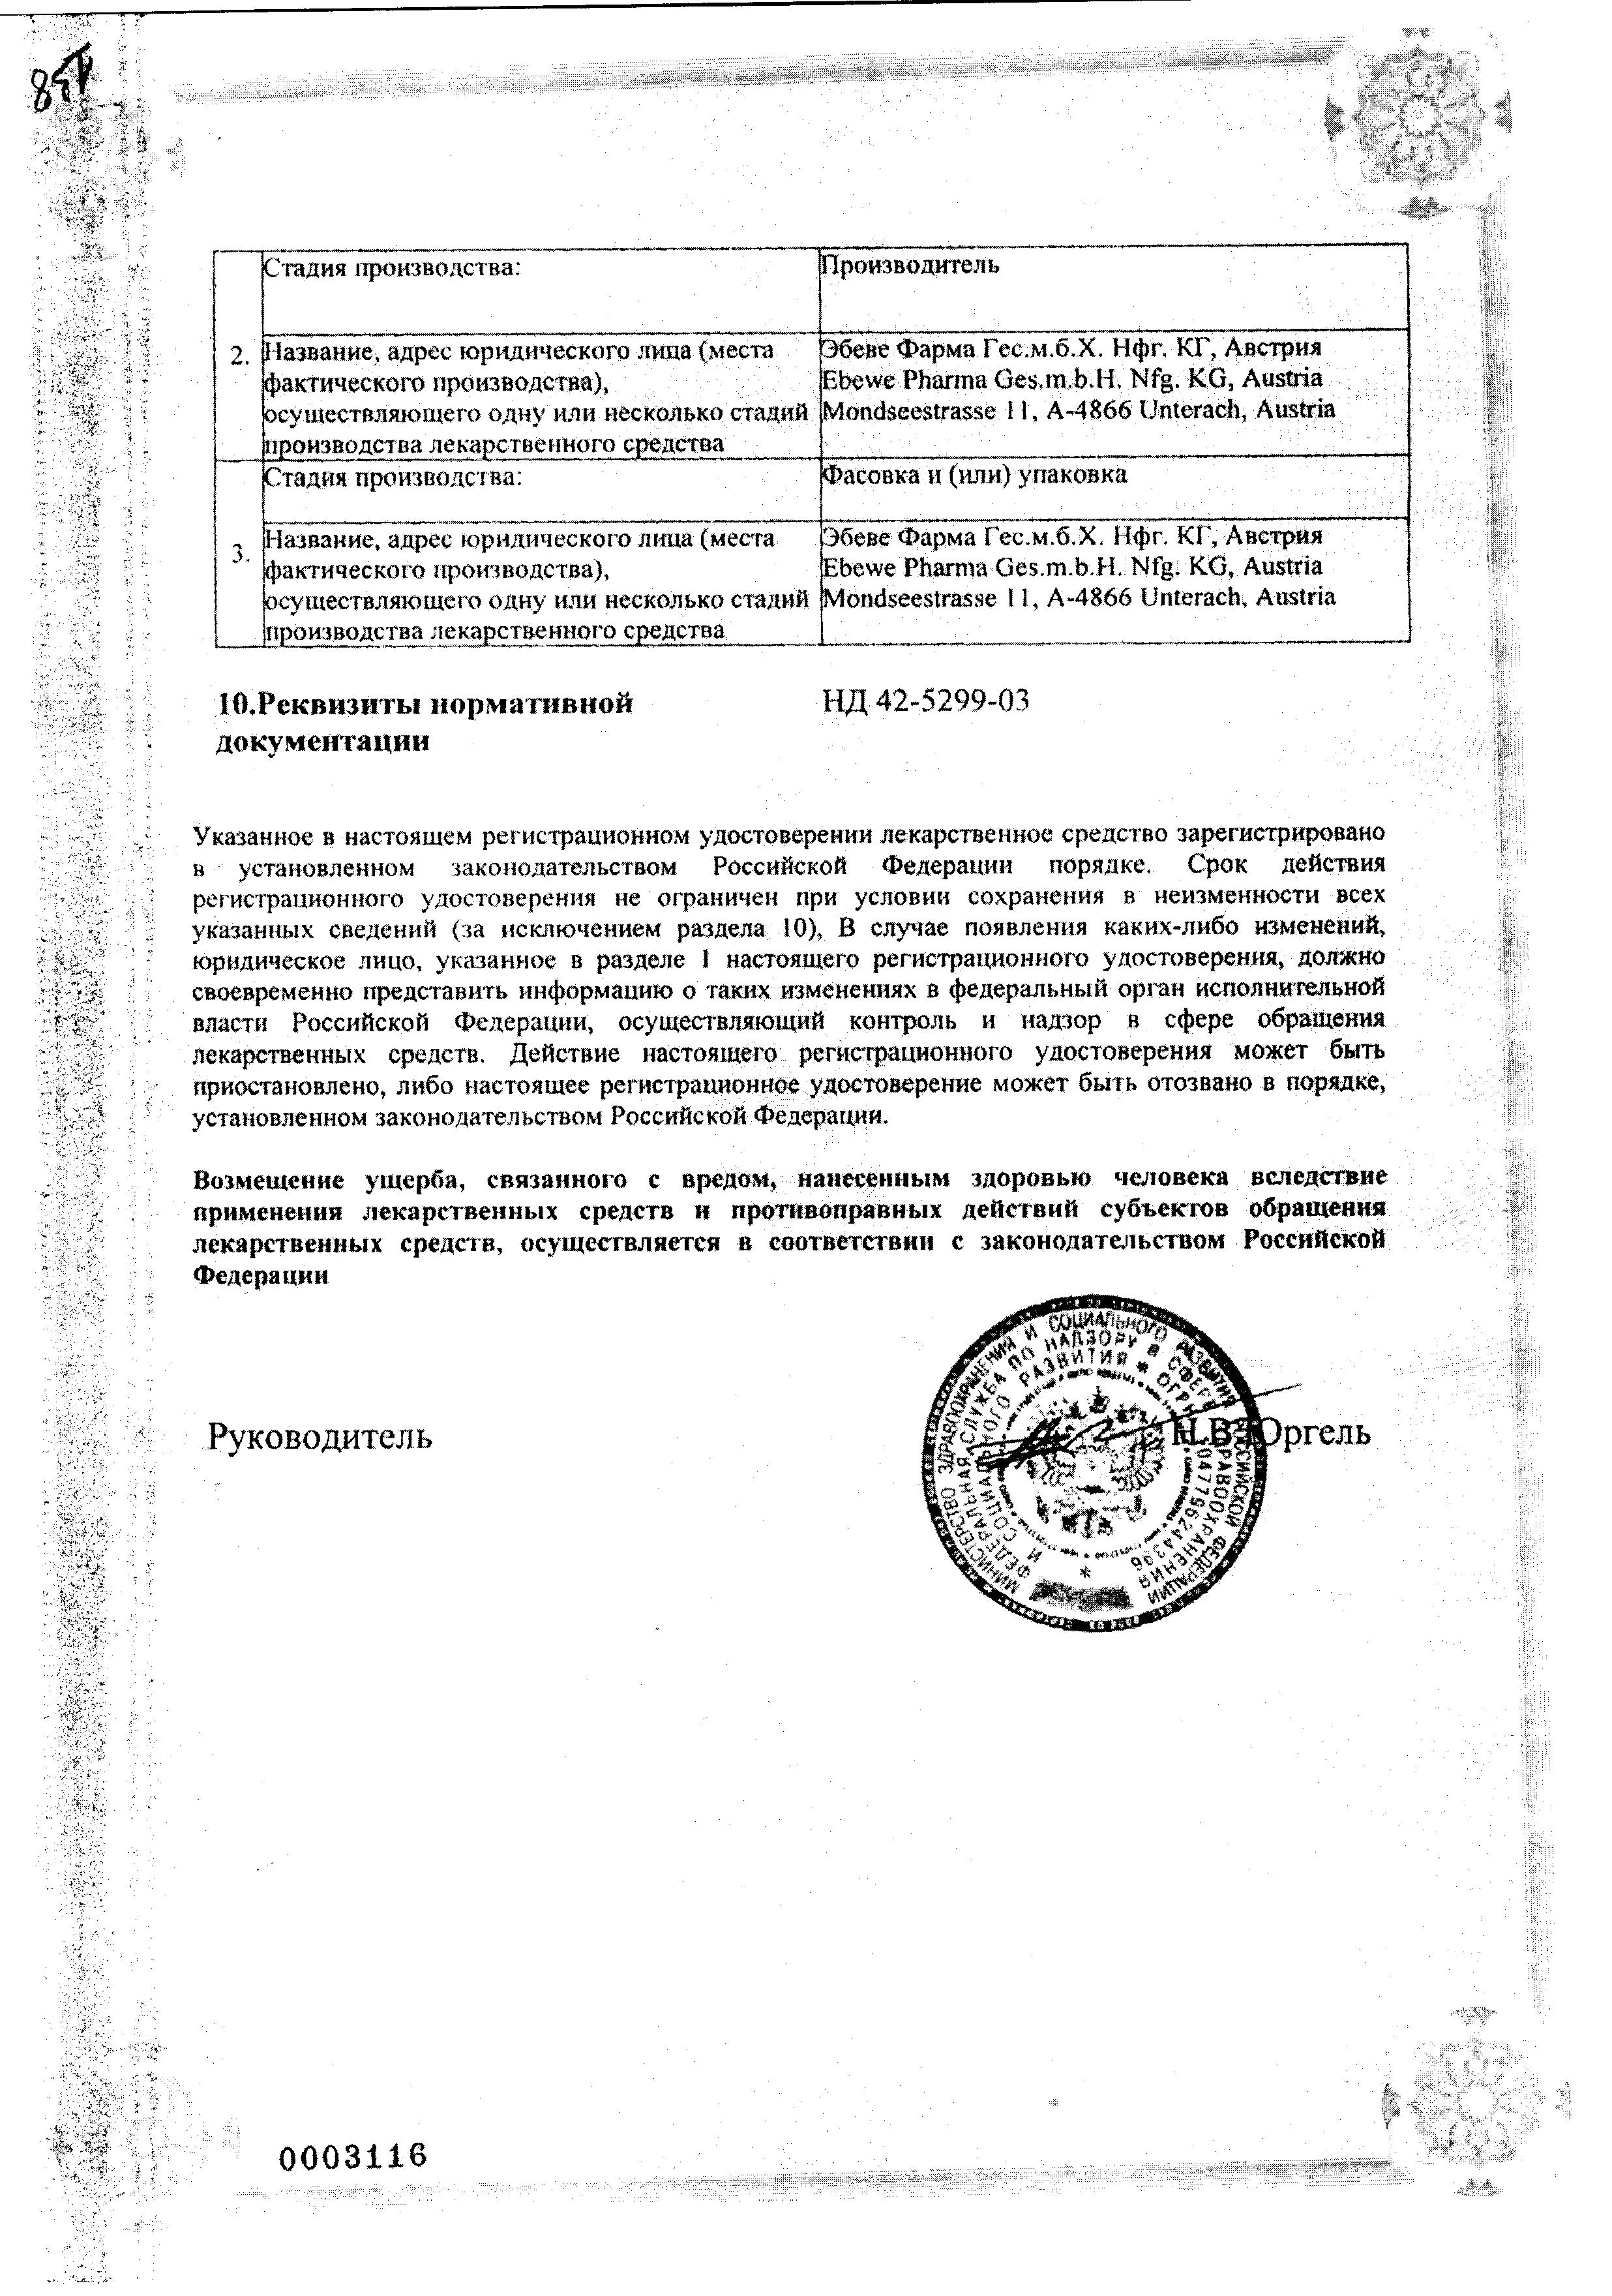 5-Фторурацил-Эбеве сертификат